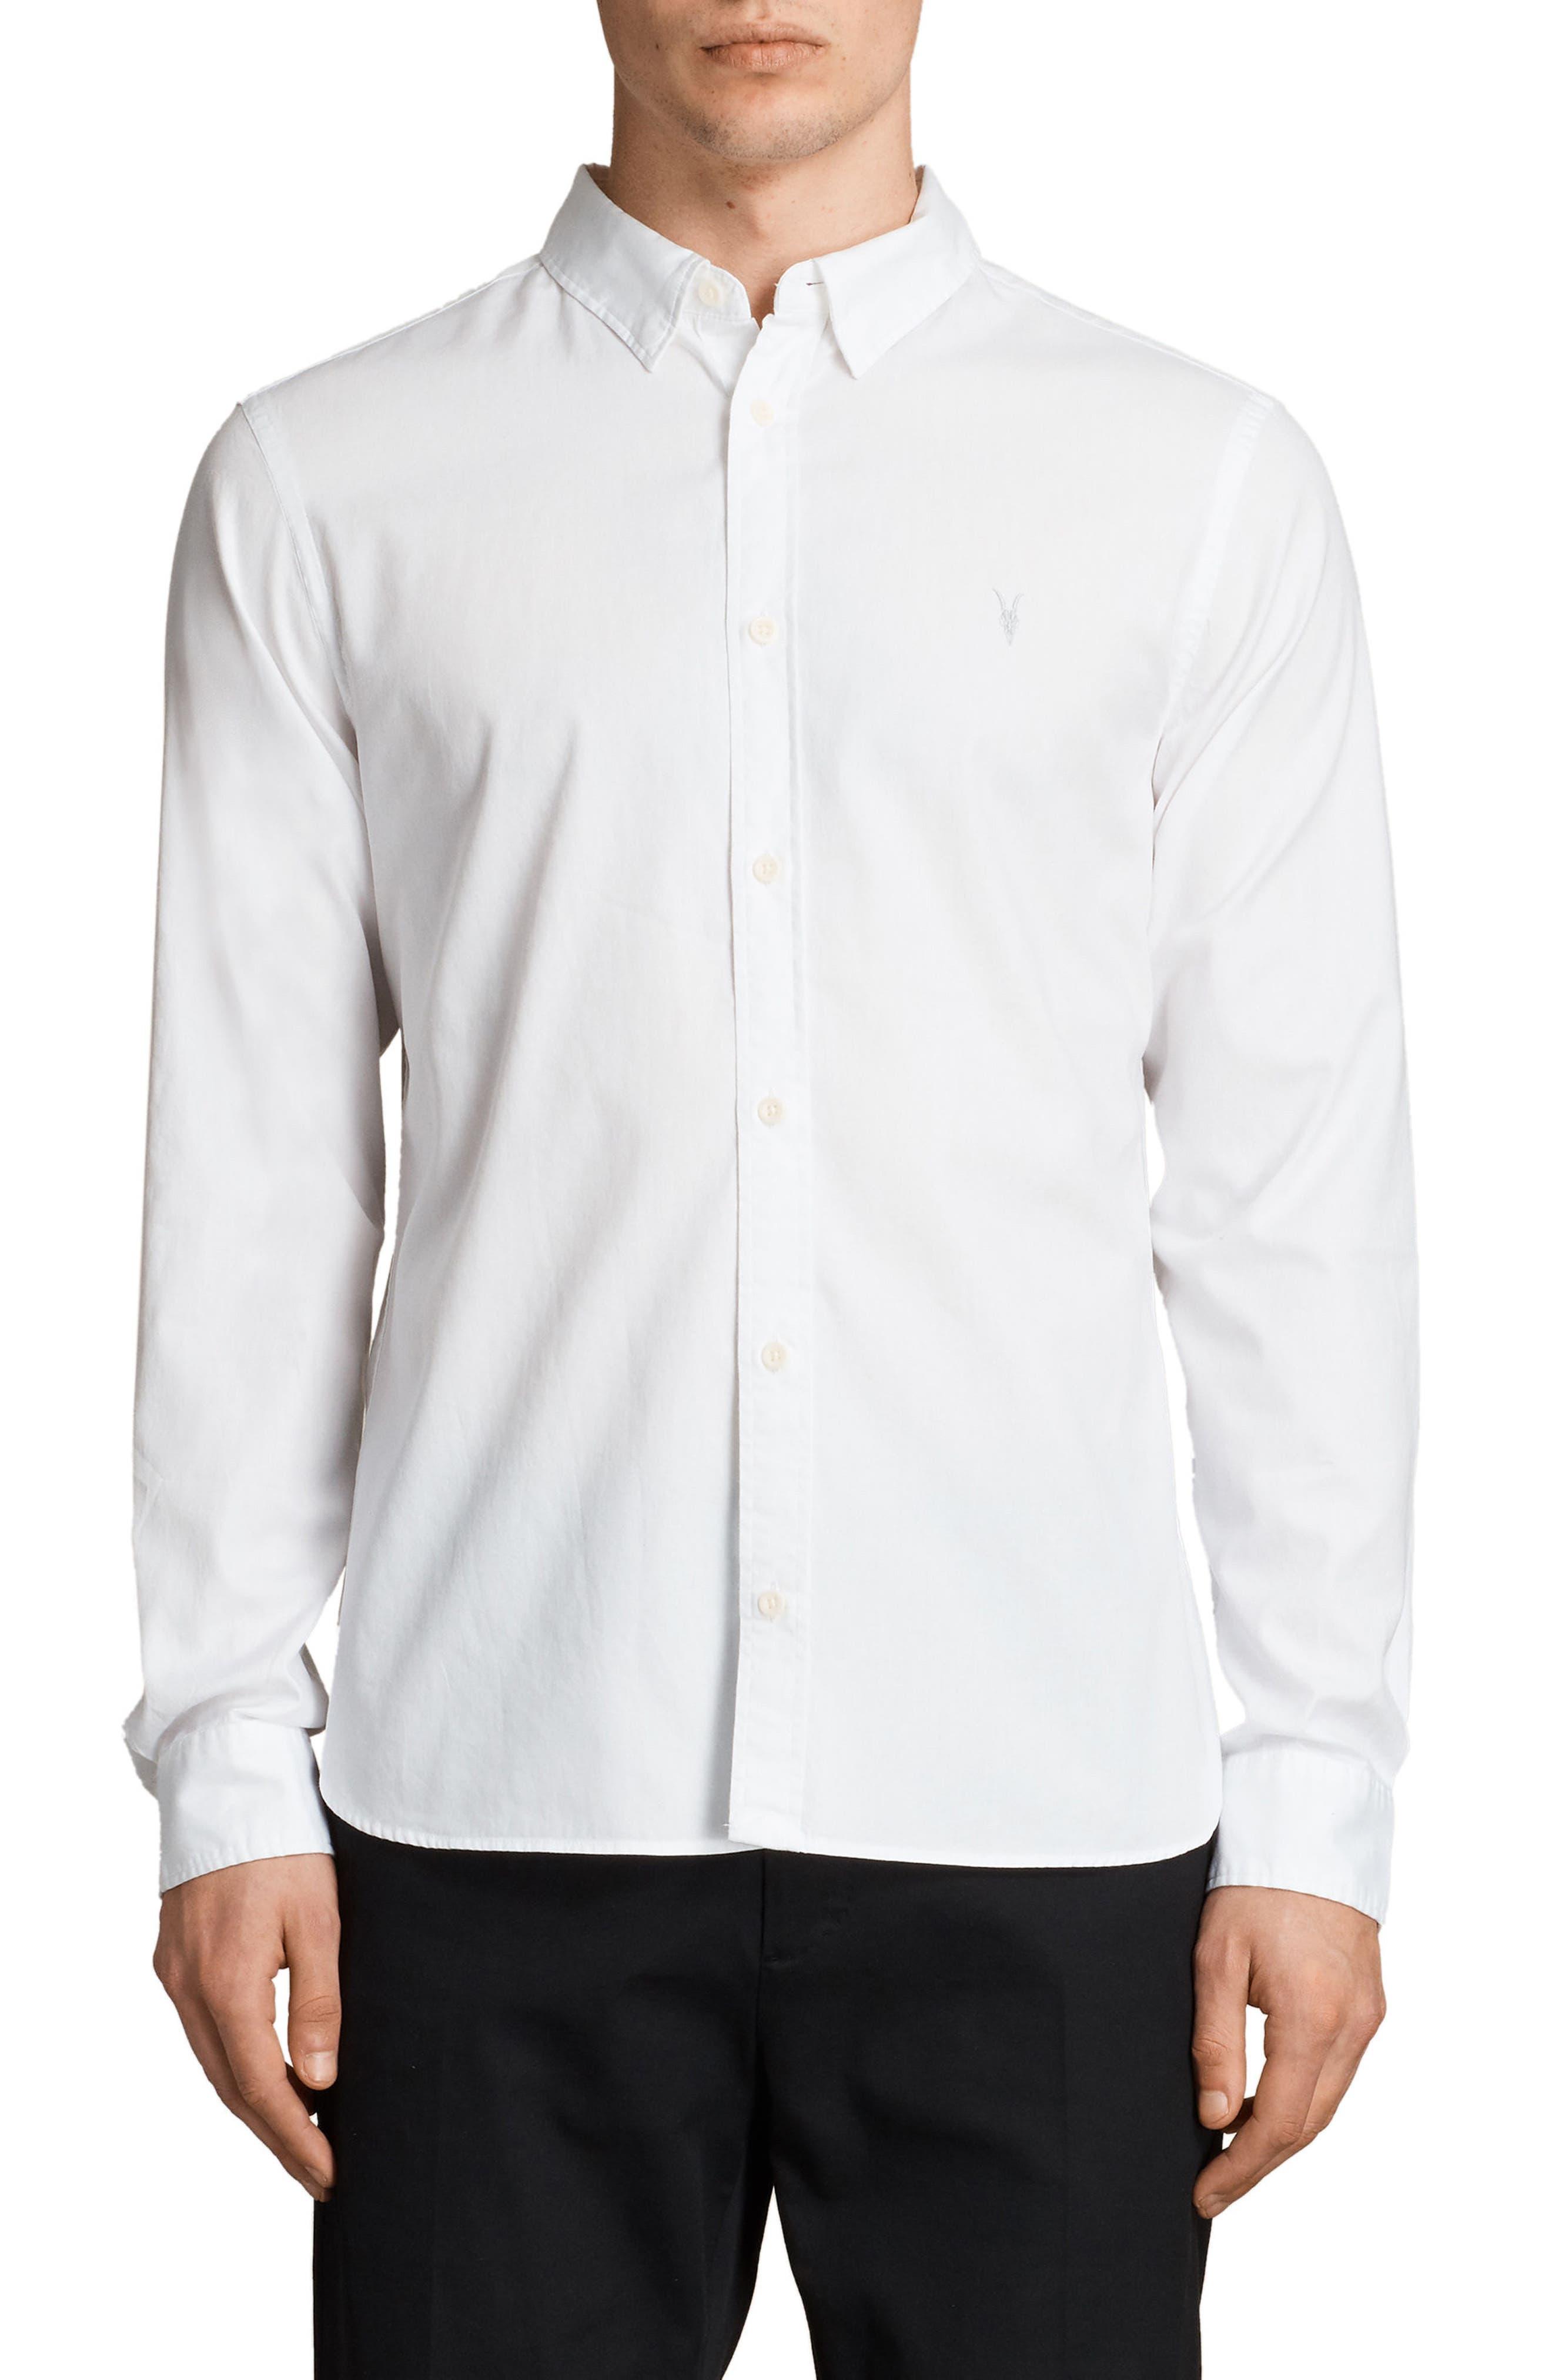 Redondo Slim Fit Shirt,                             Main thumbnail 1, color,                             White